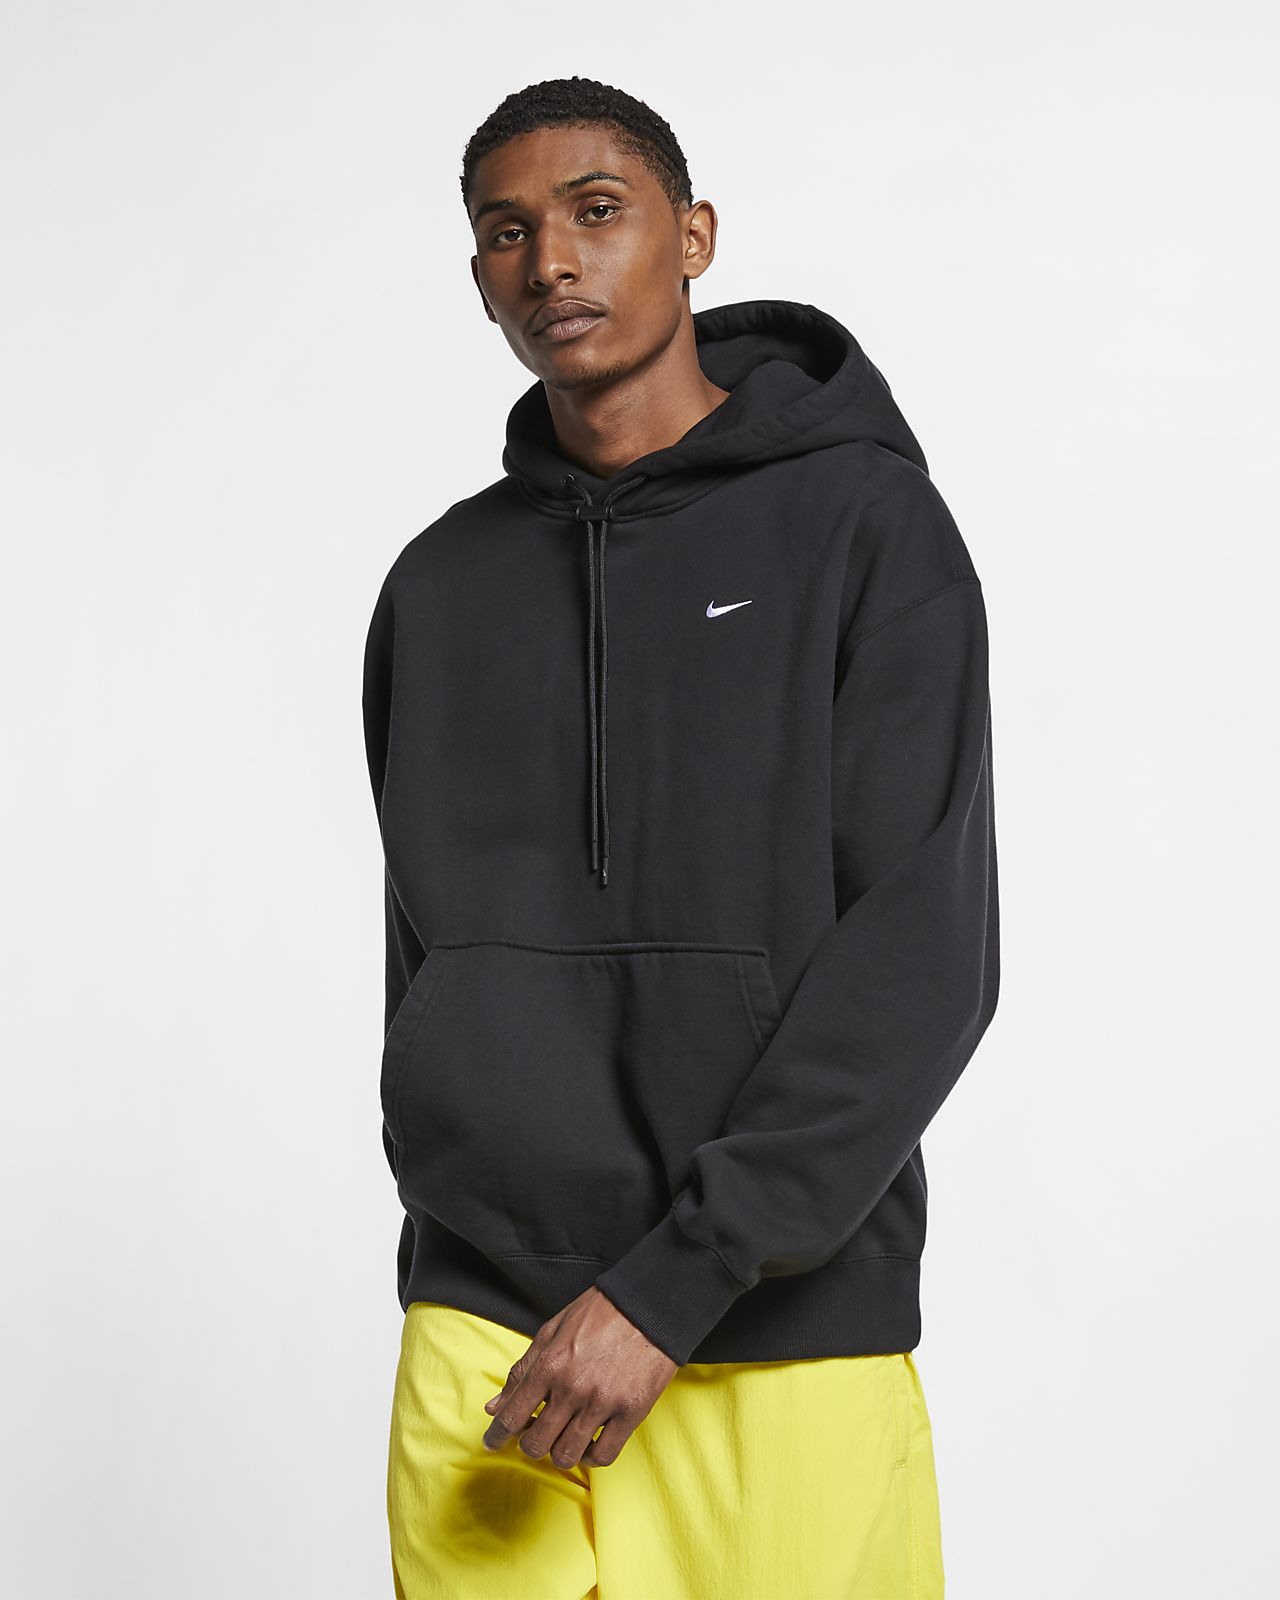 NikeLab Collection 男子套头连帽衫